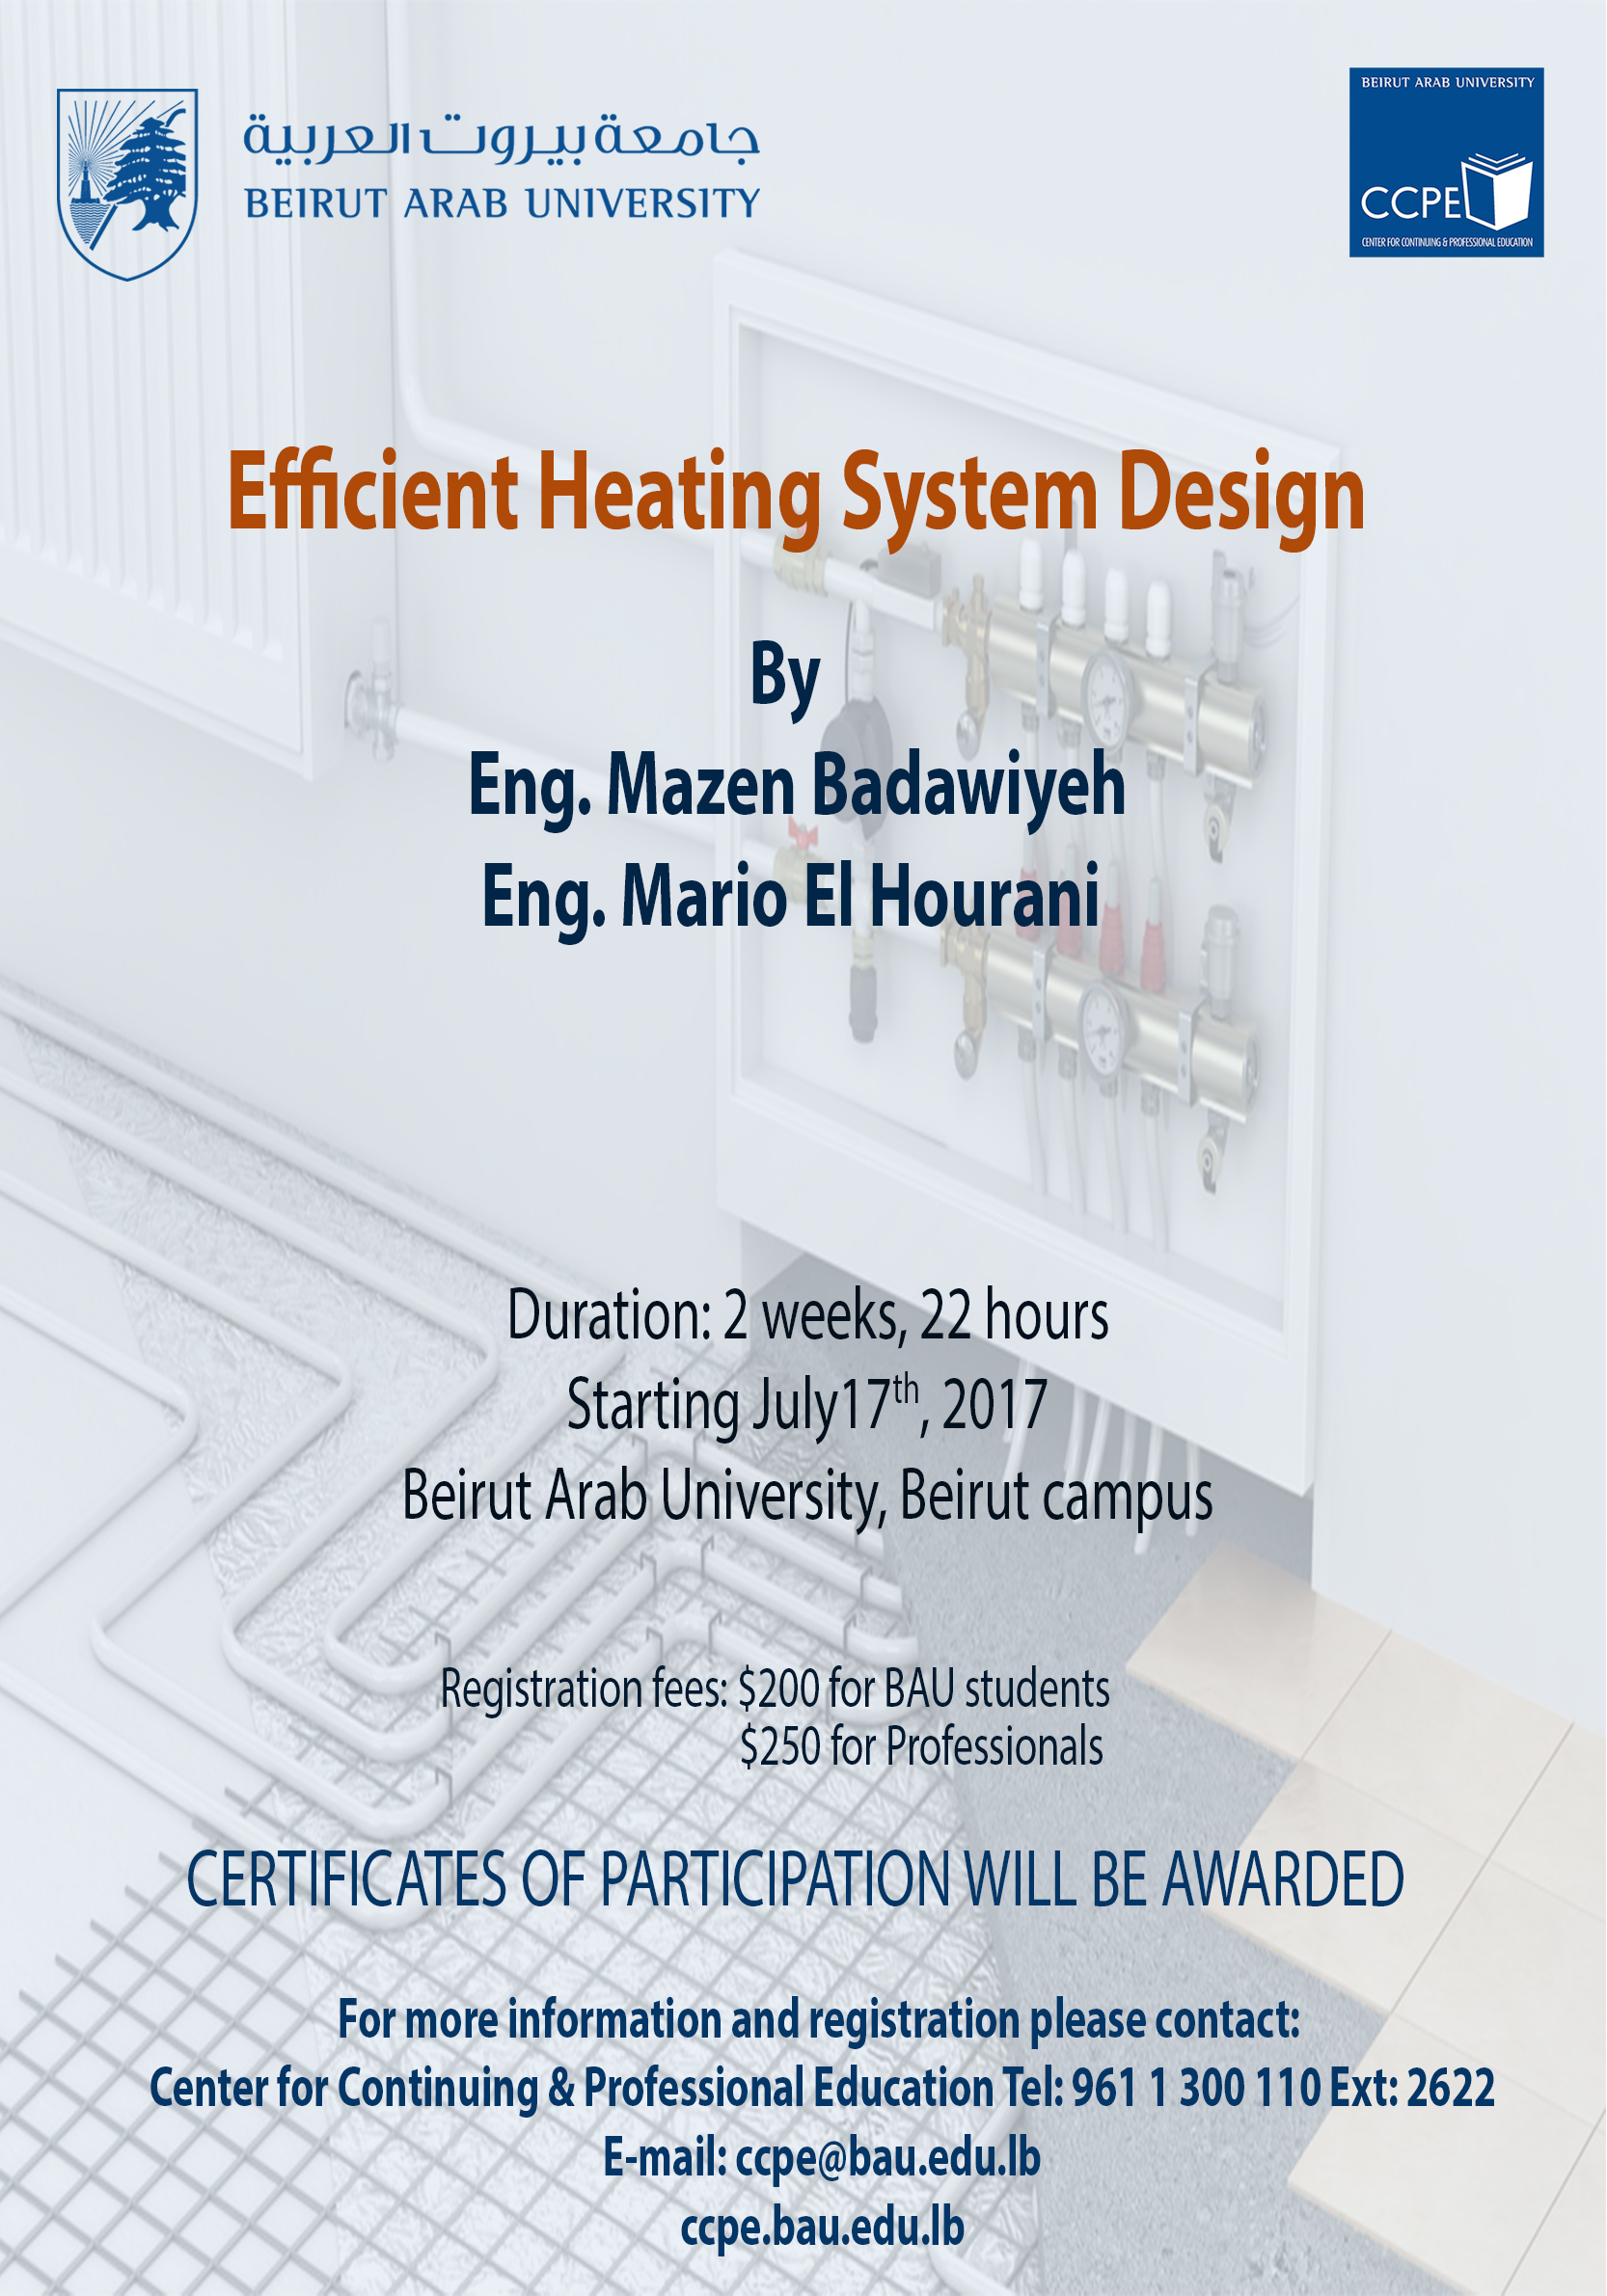 CCPE » Efficient Heating System Design